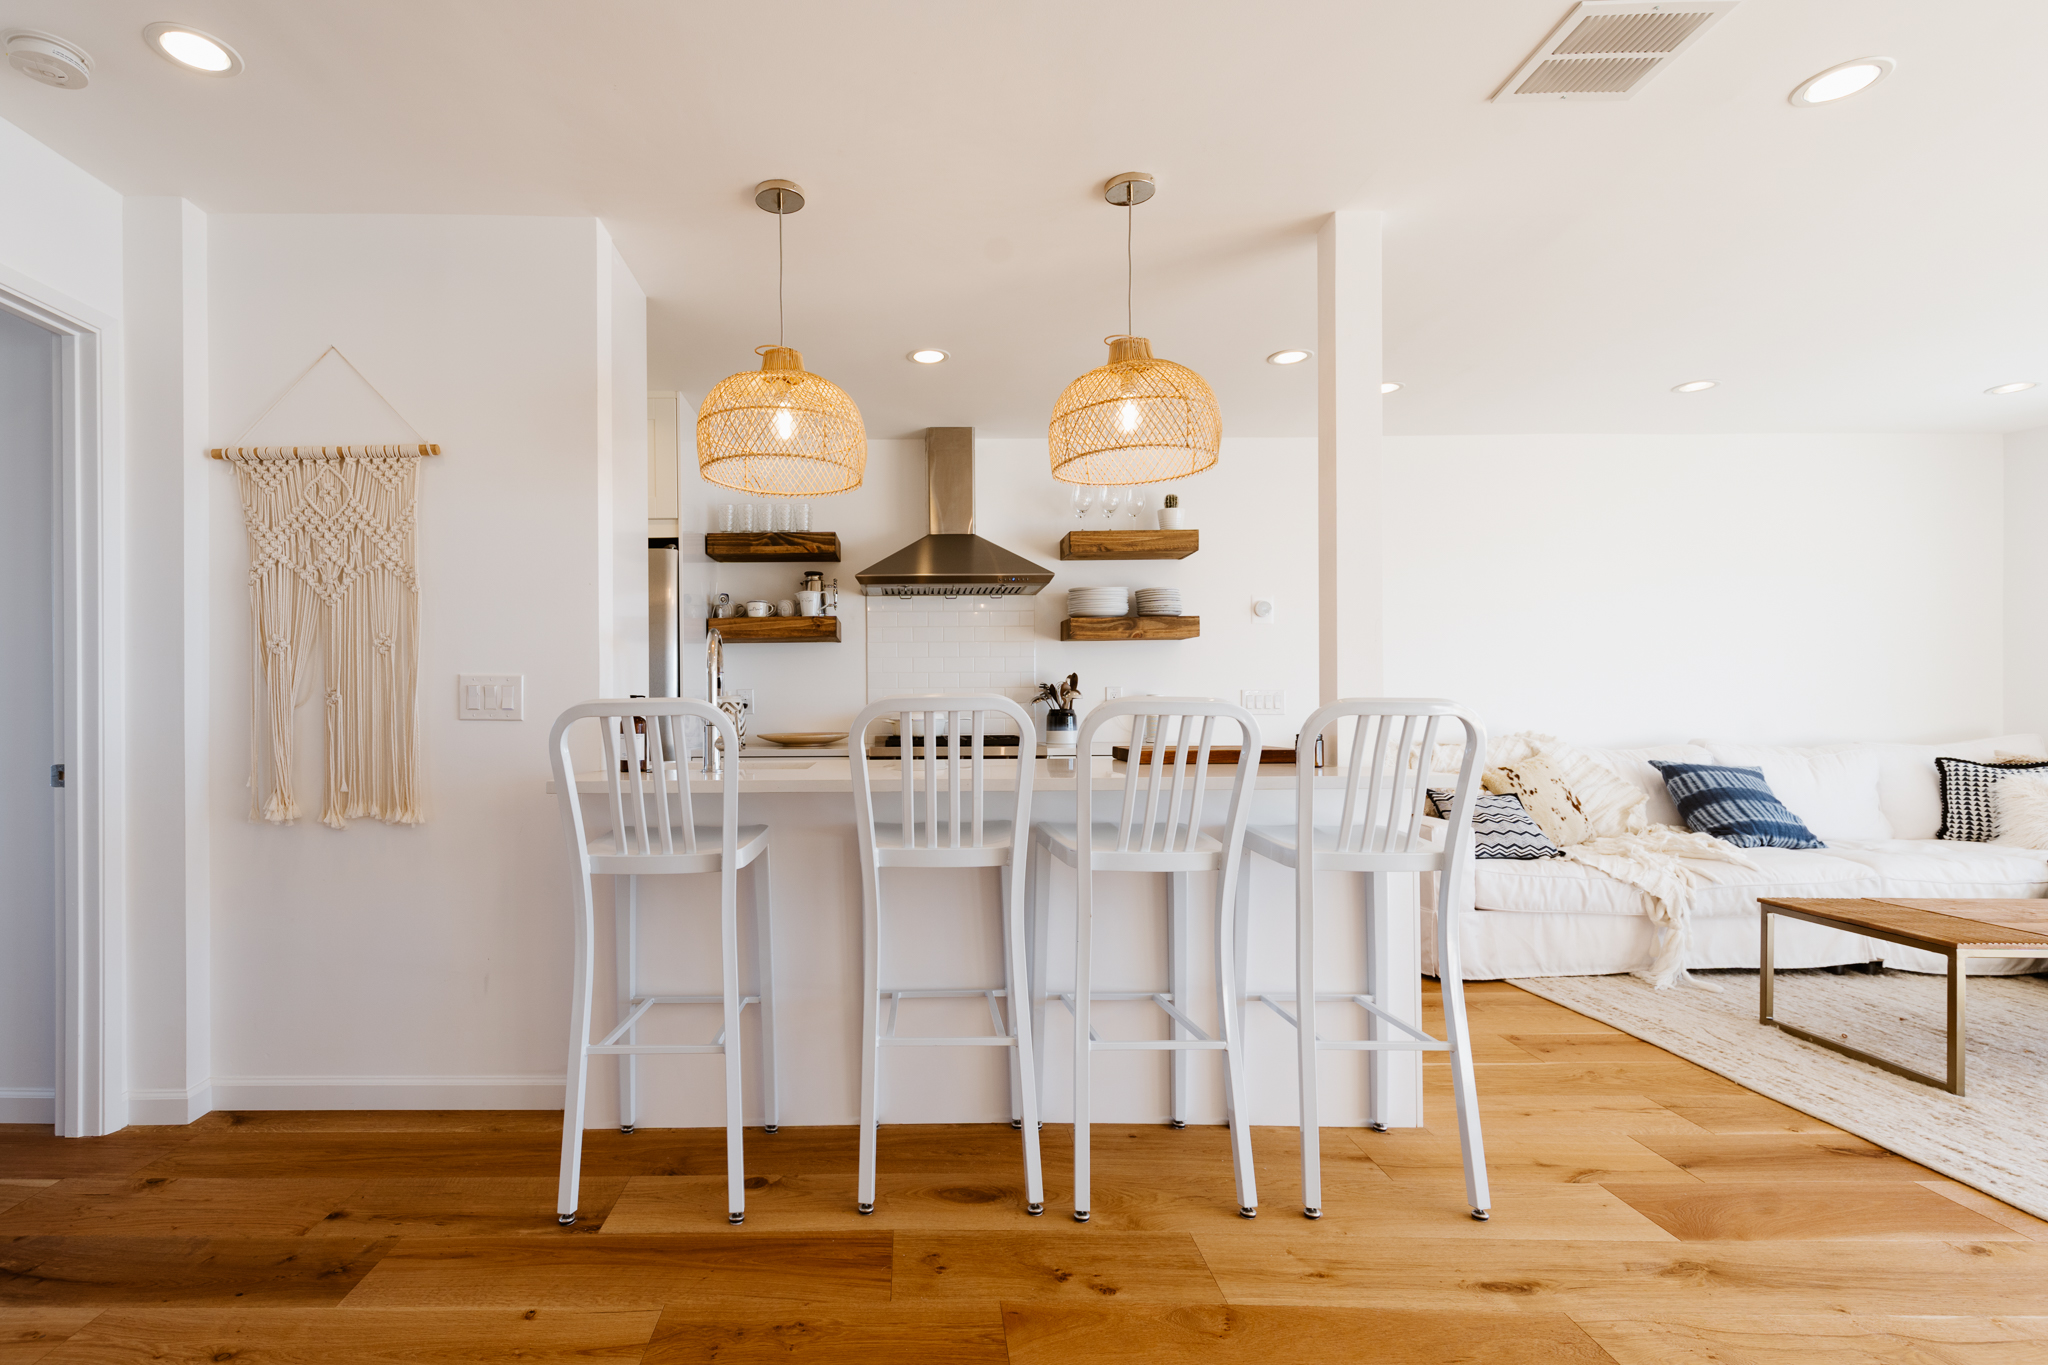 Tuttle-20181106-Airbnb-0045.jpg